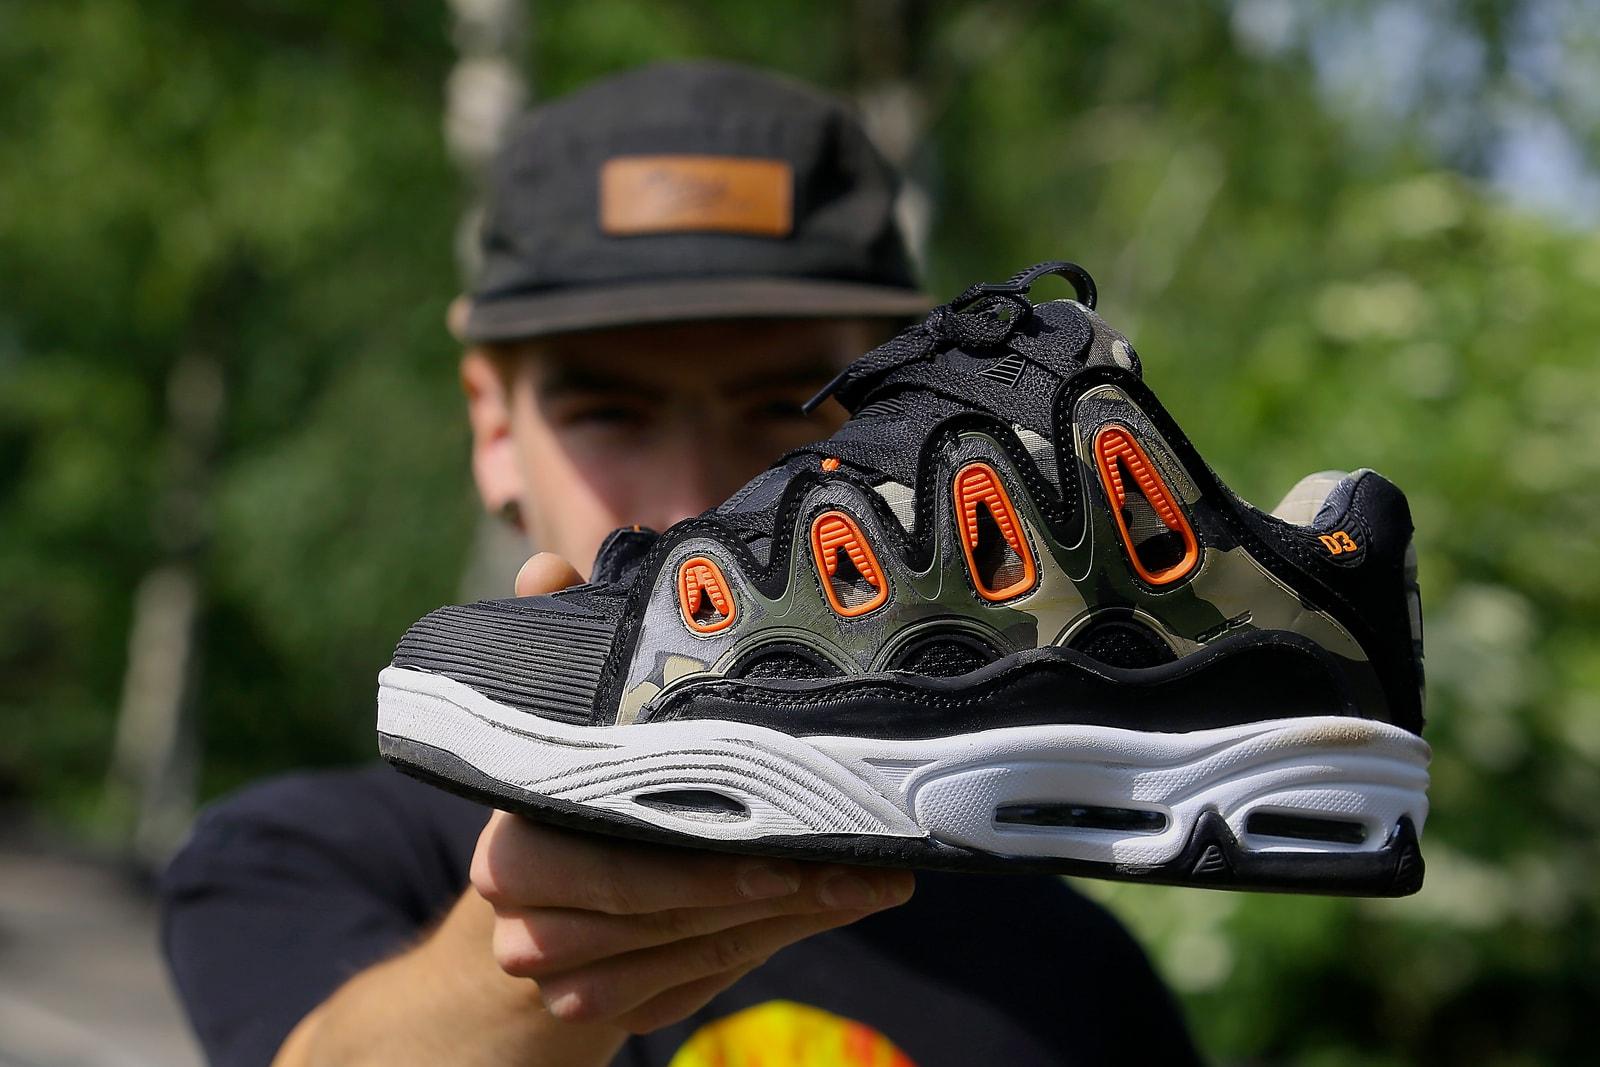 熱門鞋款 Lanvin Curb 爲何讓 24kGoldn 情有獨鍾?| Sole Mates